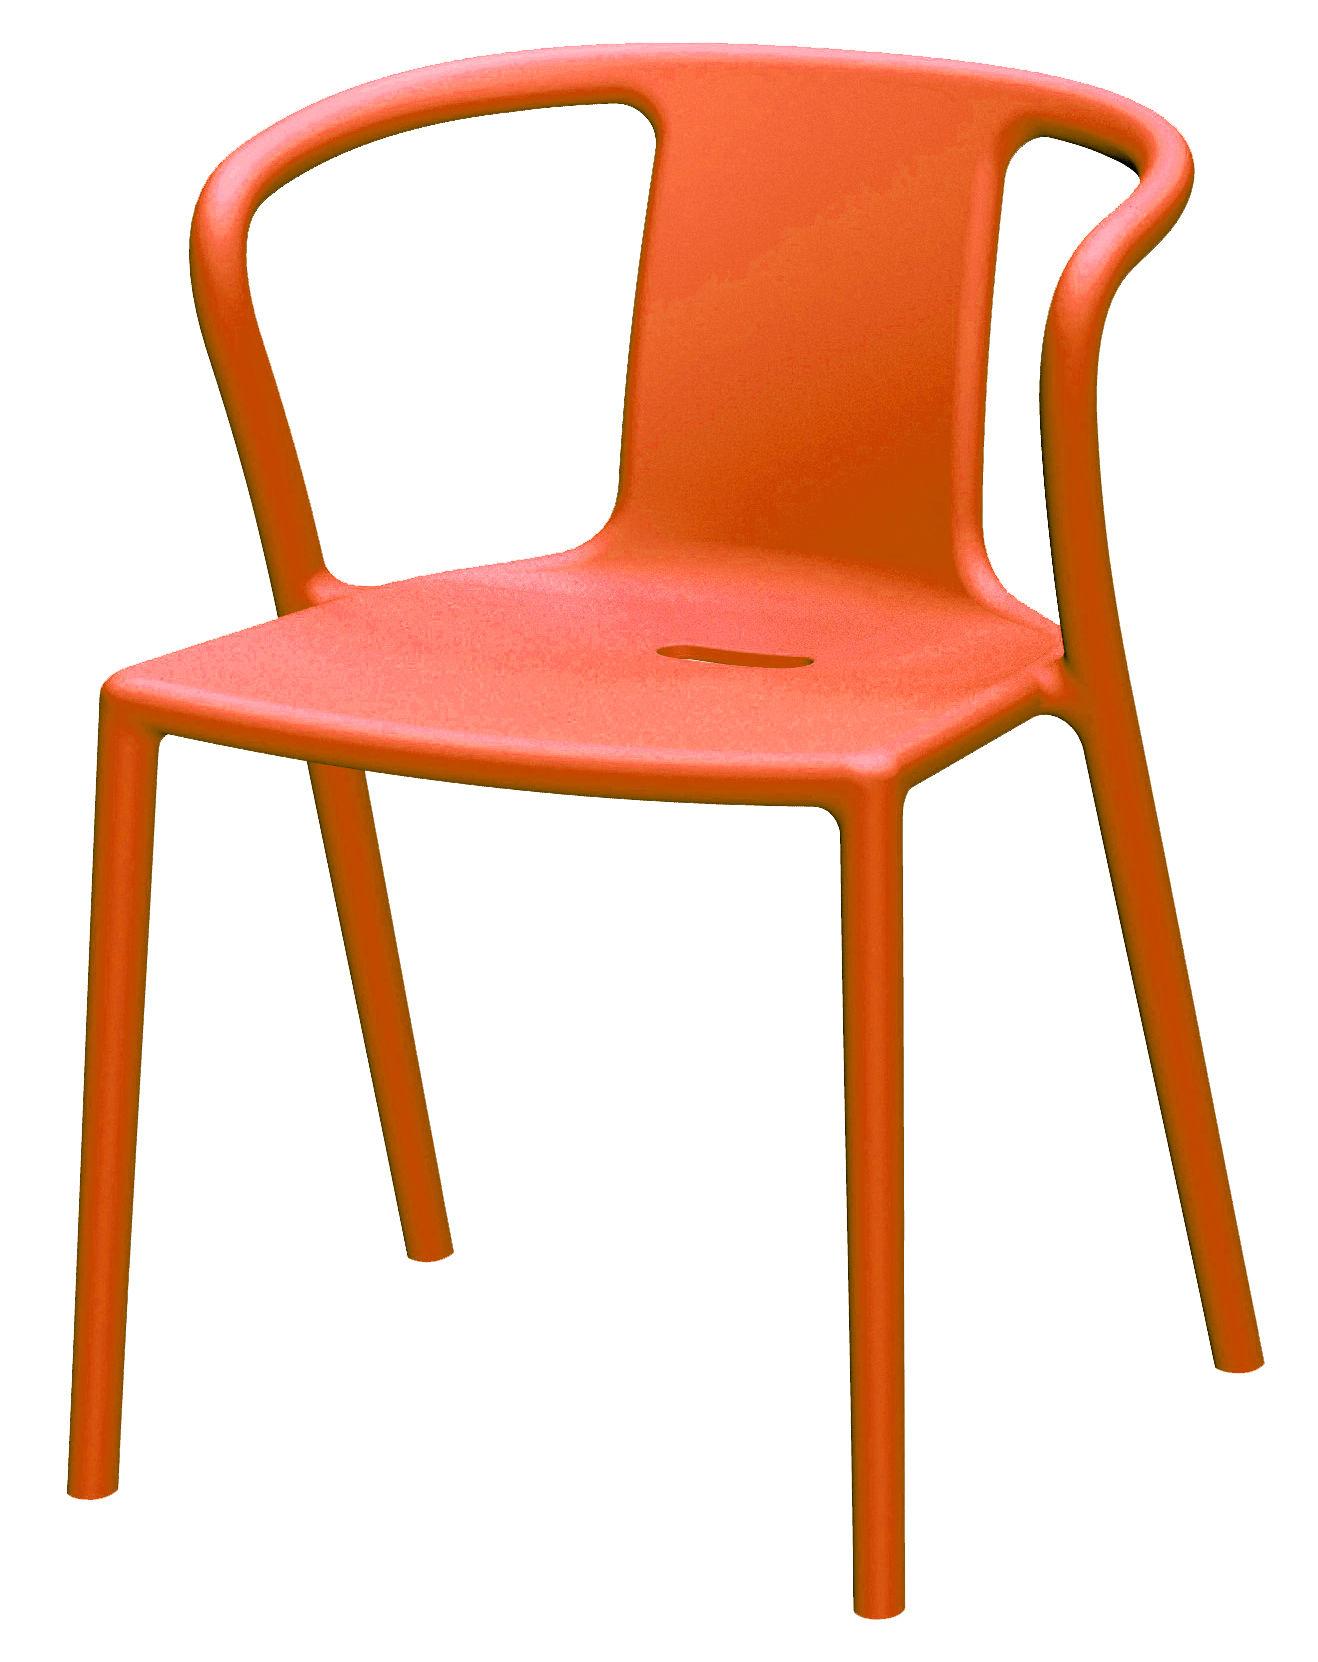 Möbel - Stühle  - Air-Armchair Stapelbarer Sessel - Magis - Orange - Polypropylen